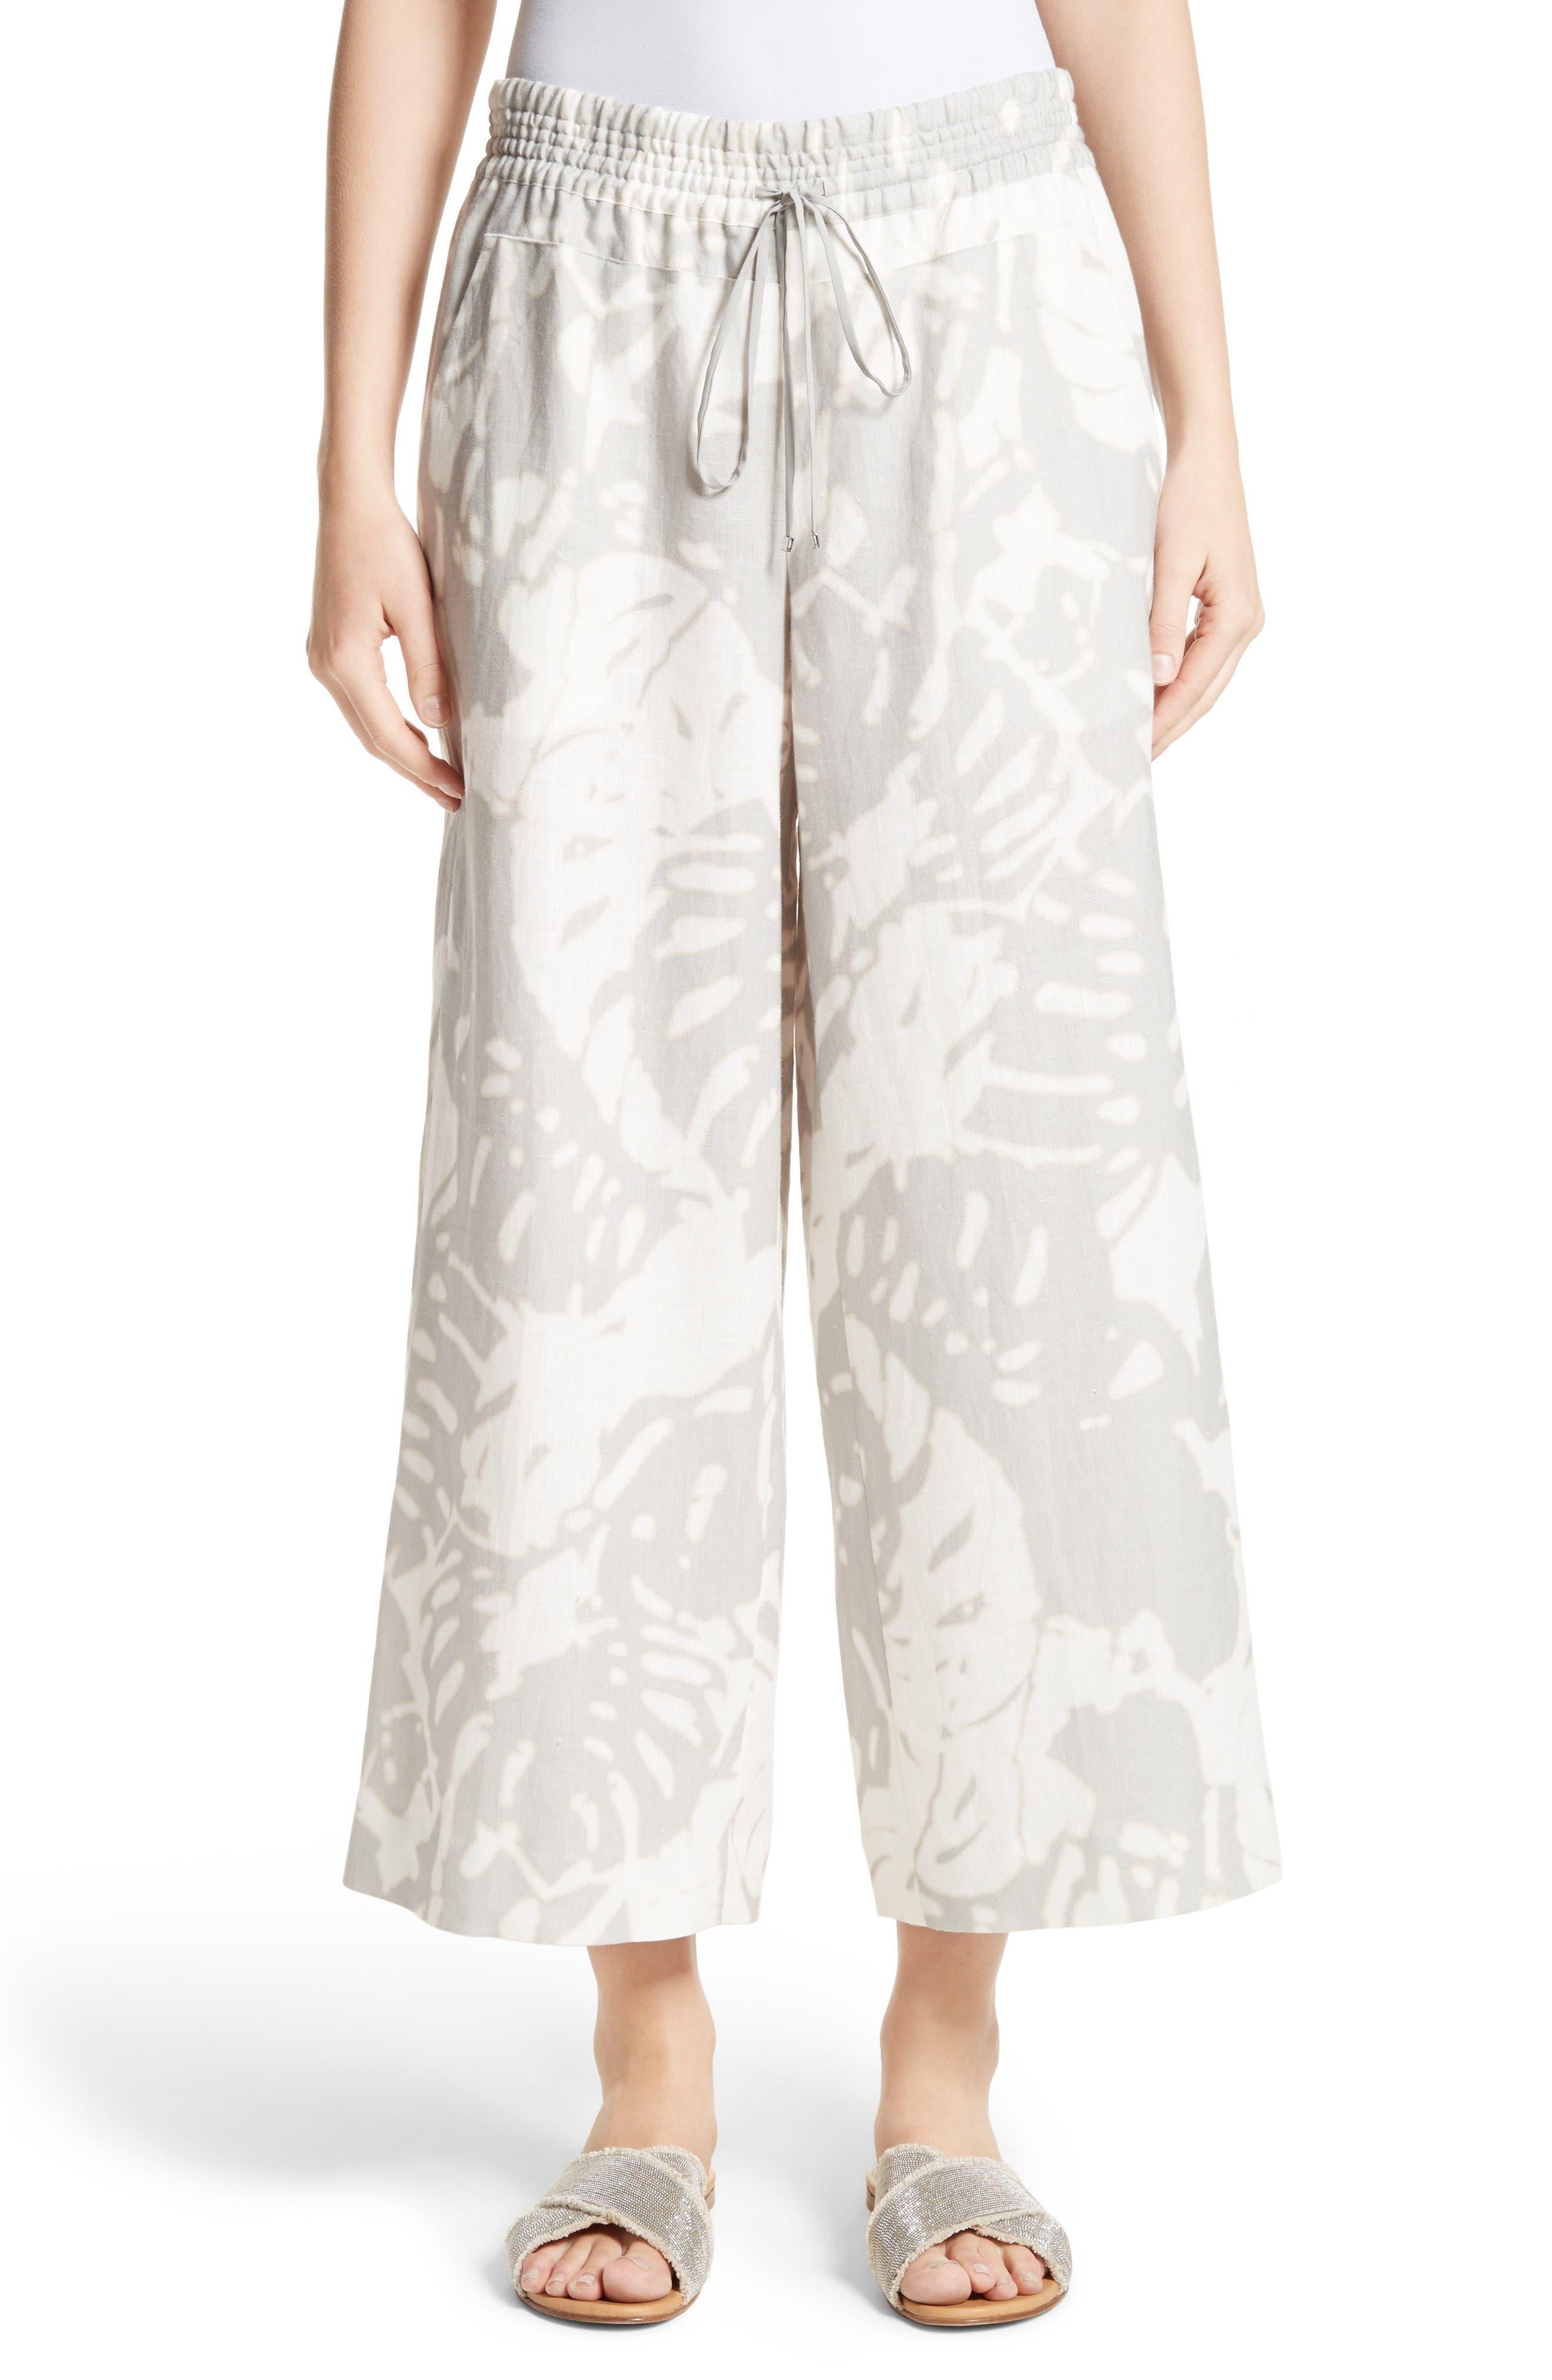 Lafayette 148 New York Crop Linen Drawstring Pants